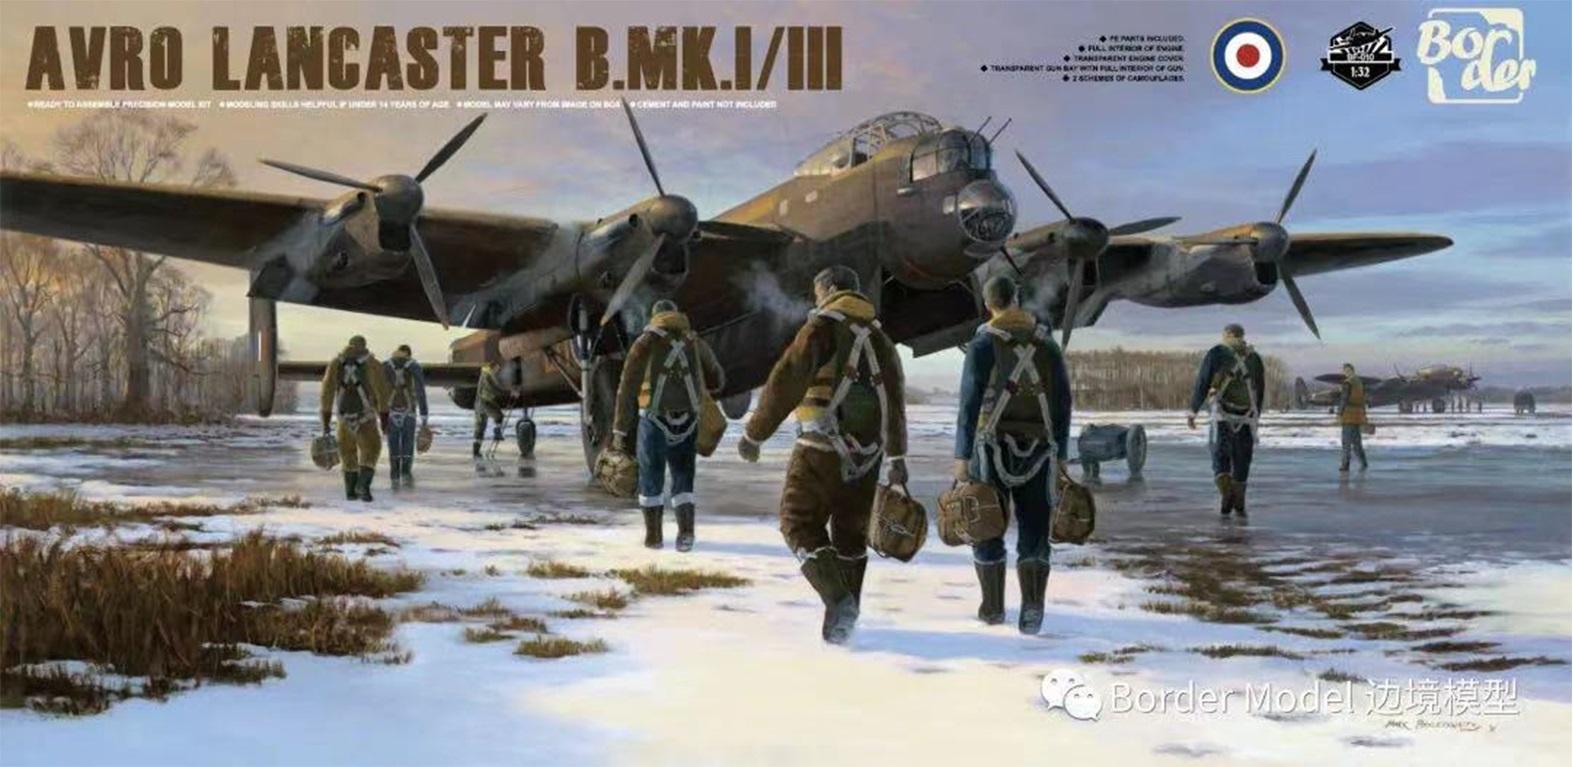 Avro Lancaster B Mk.I/III with full Interior (PRE-Order Deposit €50,00 - please read description)